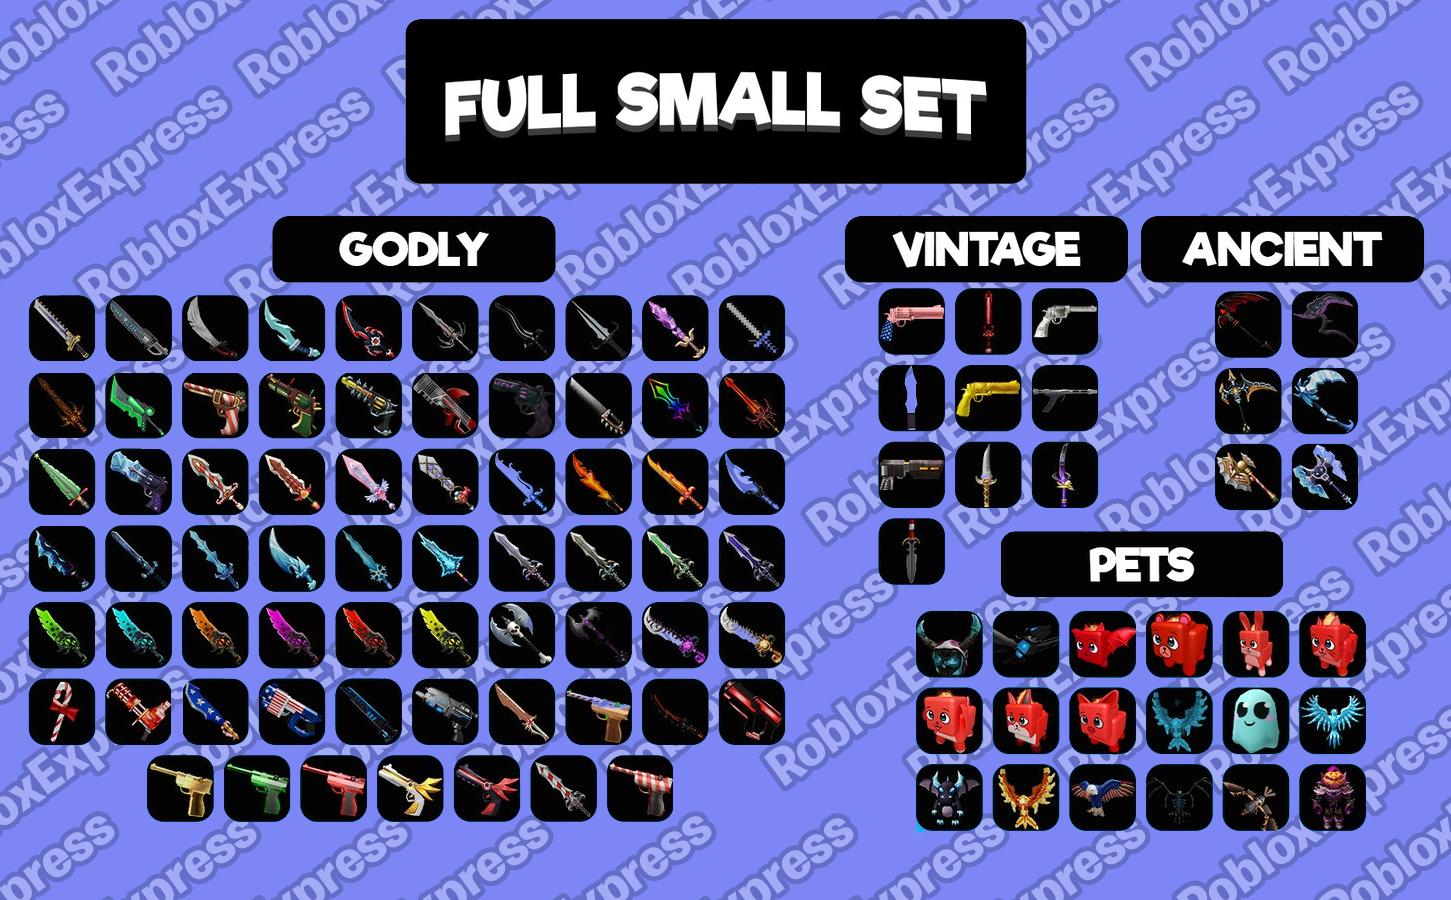 MM2 Small Set + Pet Set (102 Godly, 18 Pet)